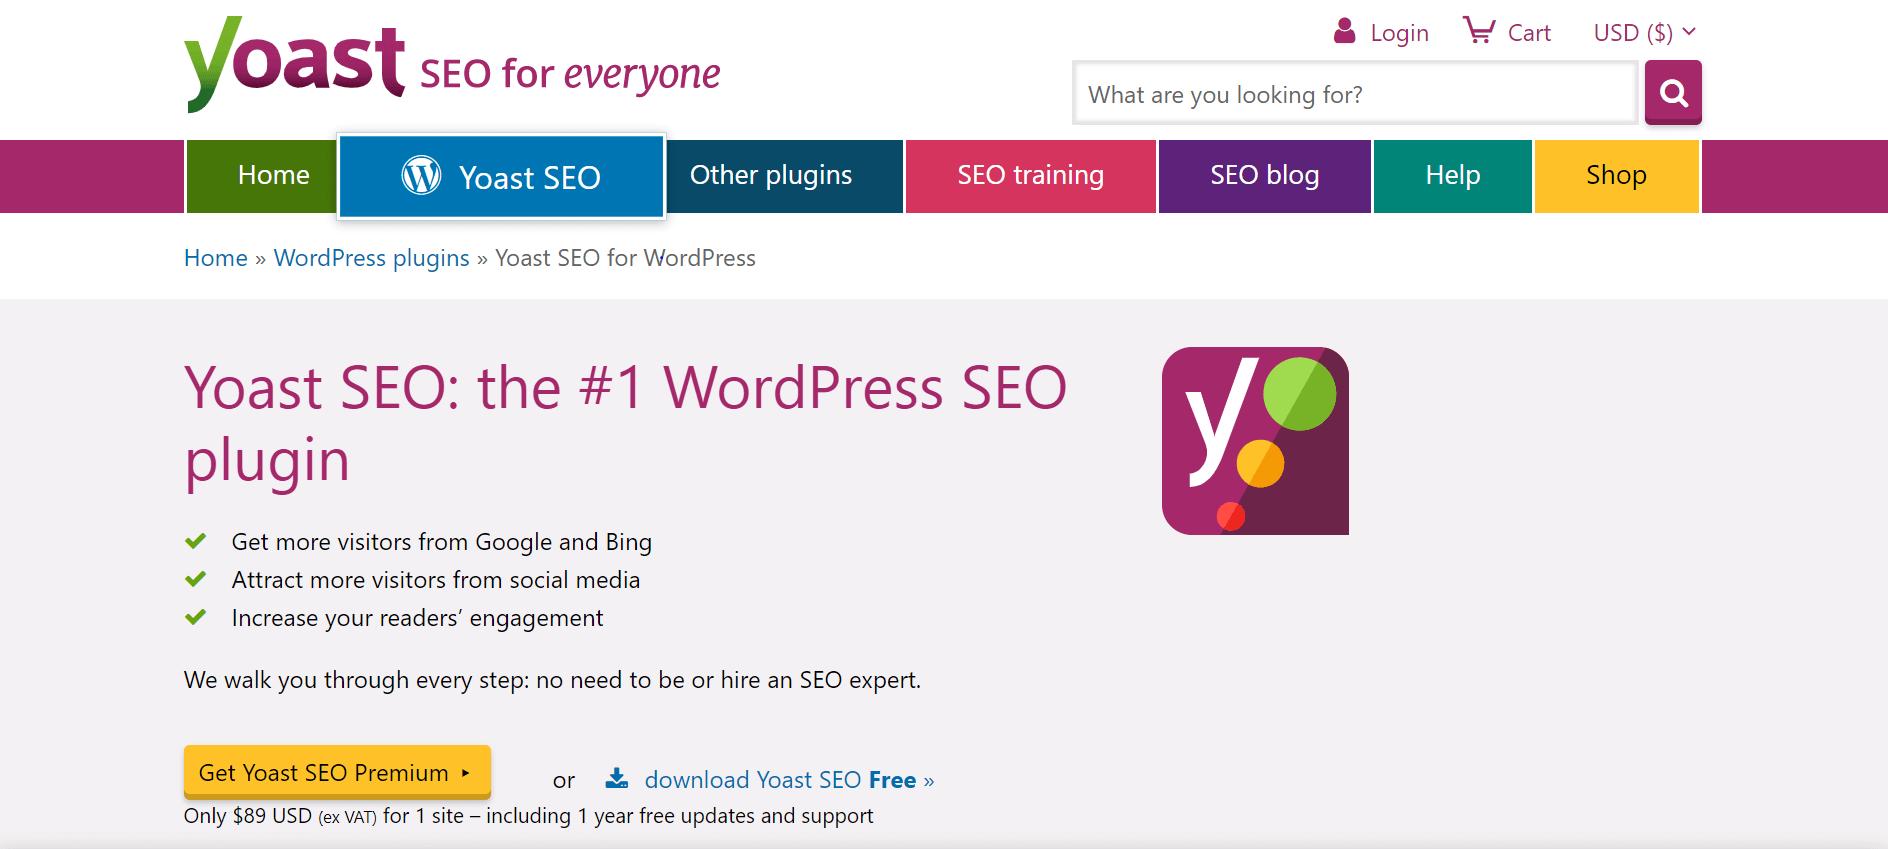 yoast-seo-wordpress-tool